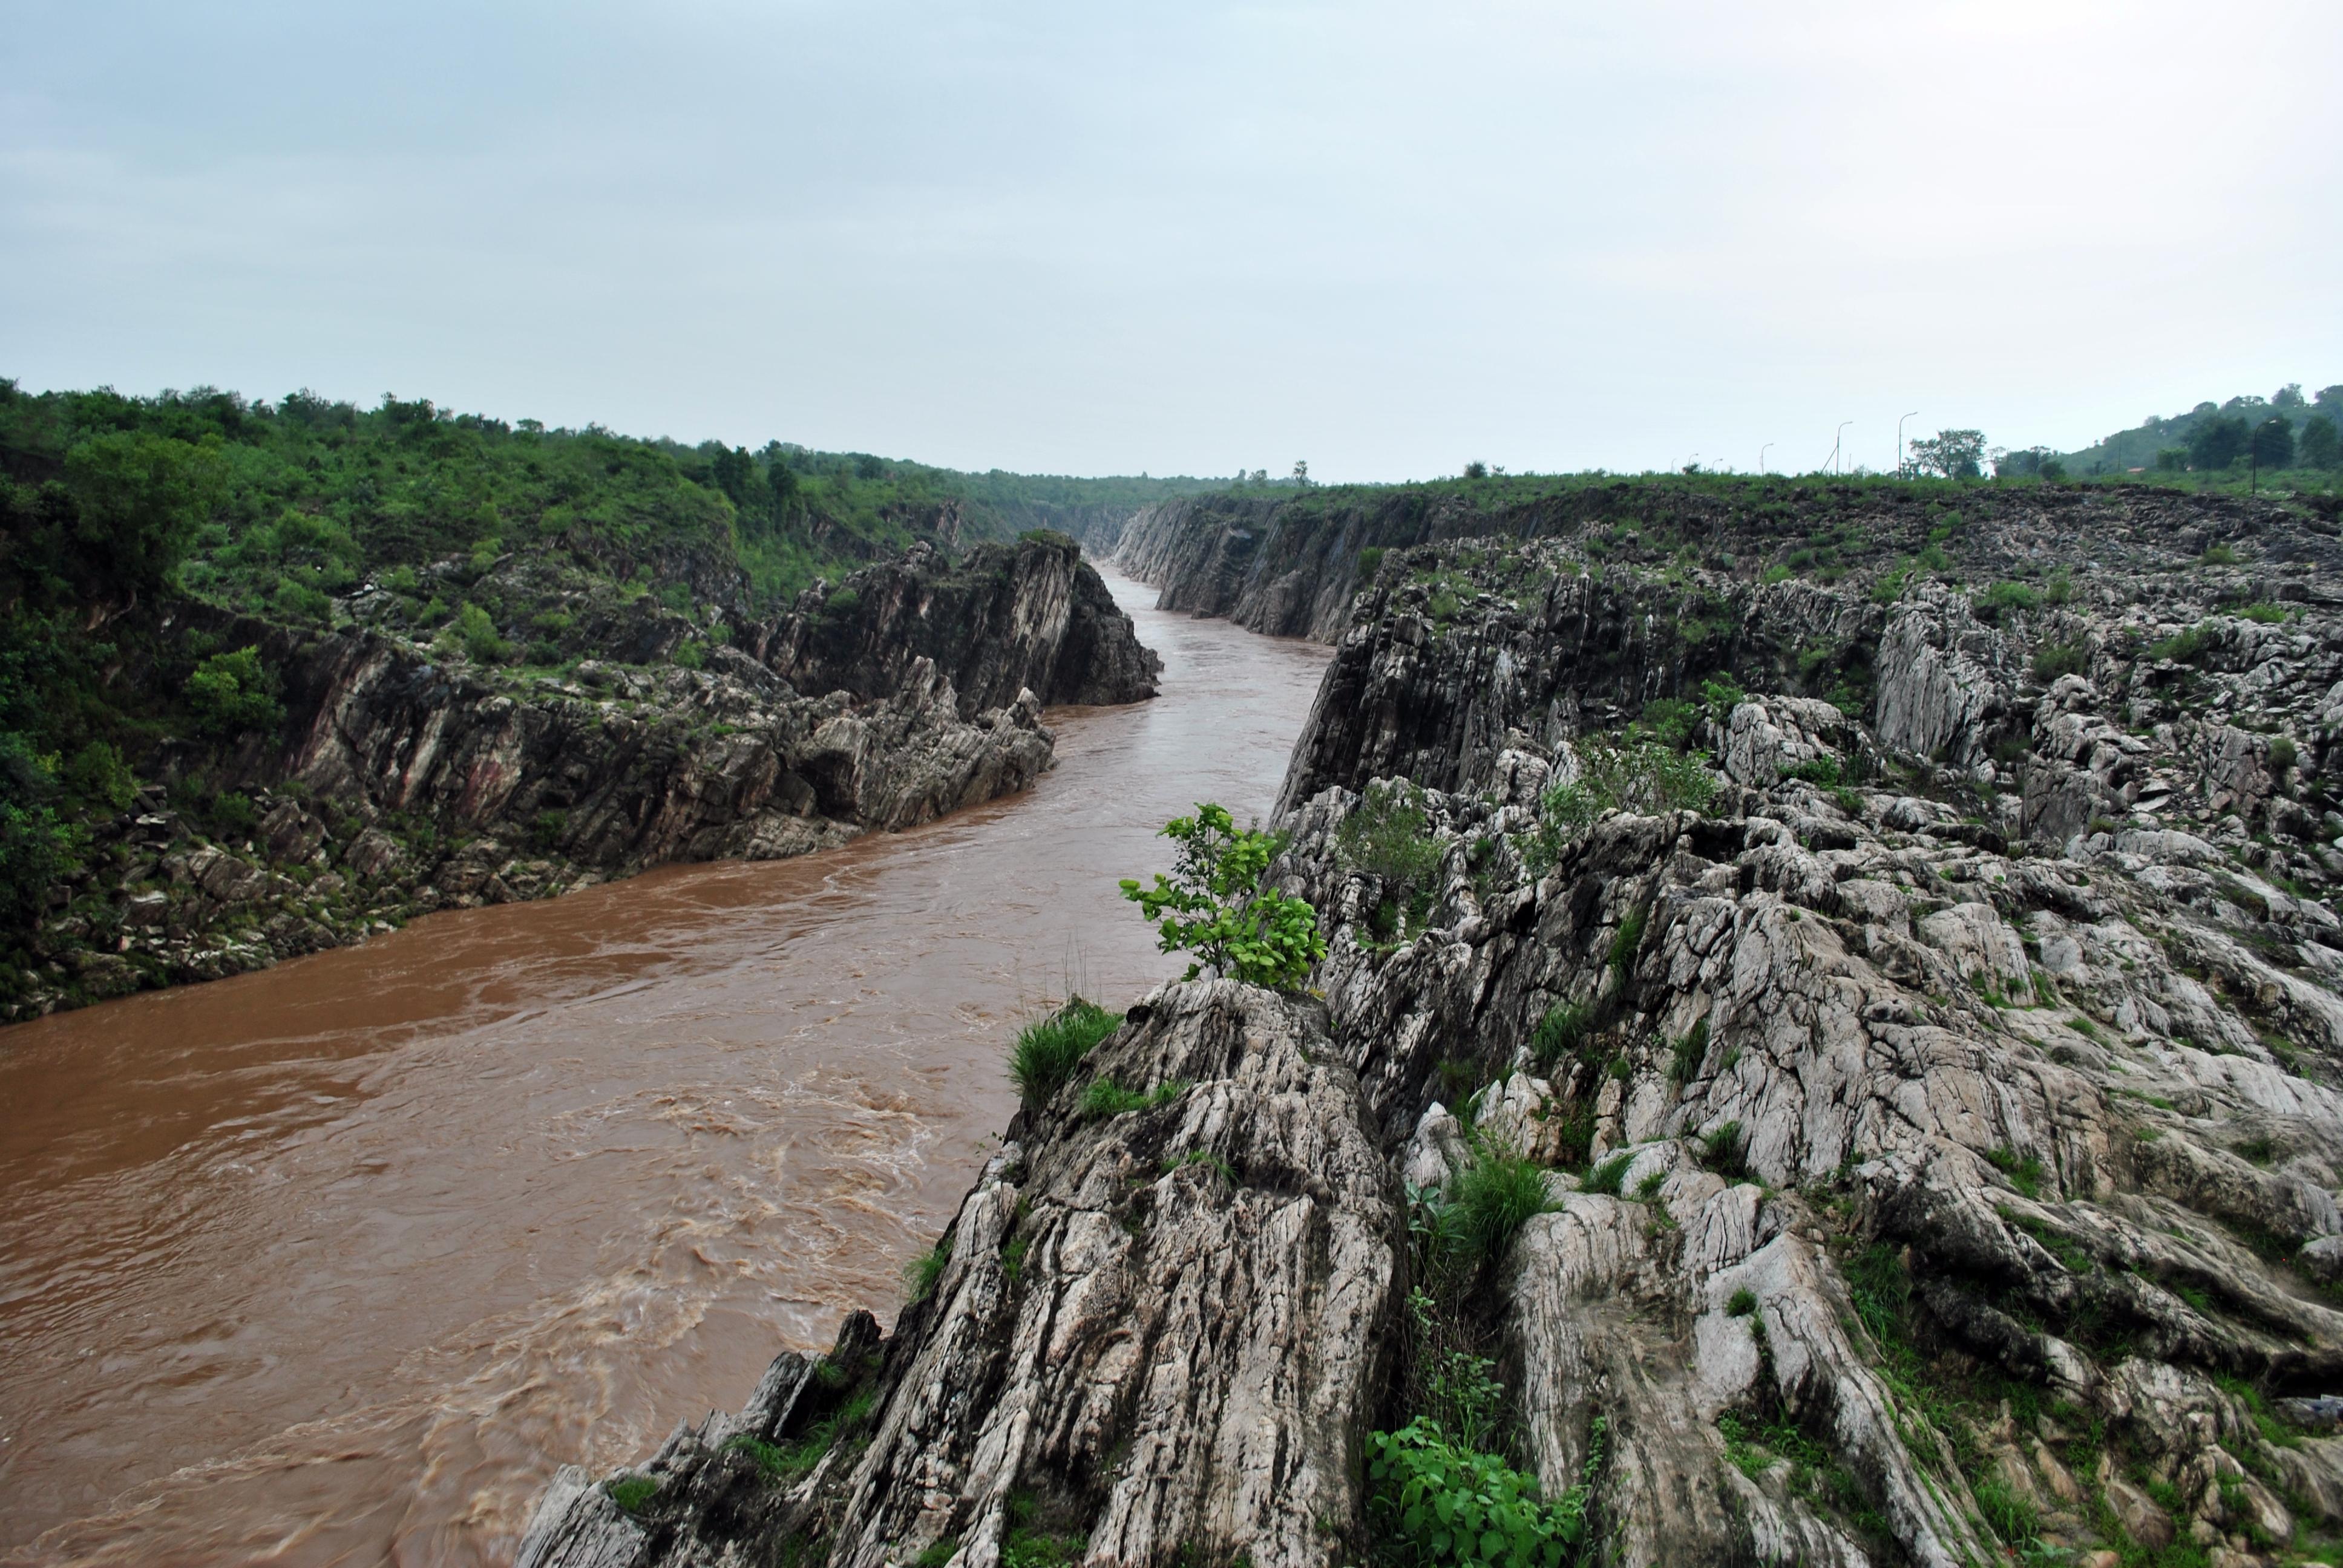 Narmada River Boating in Jabalpur | Things to do in Jabalpur | Sports